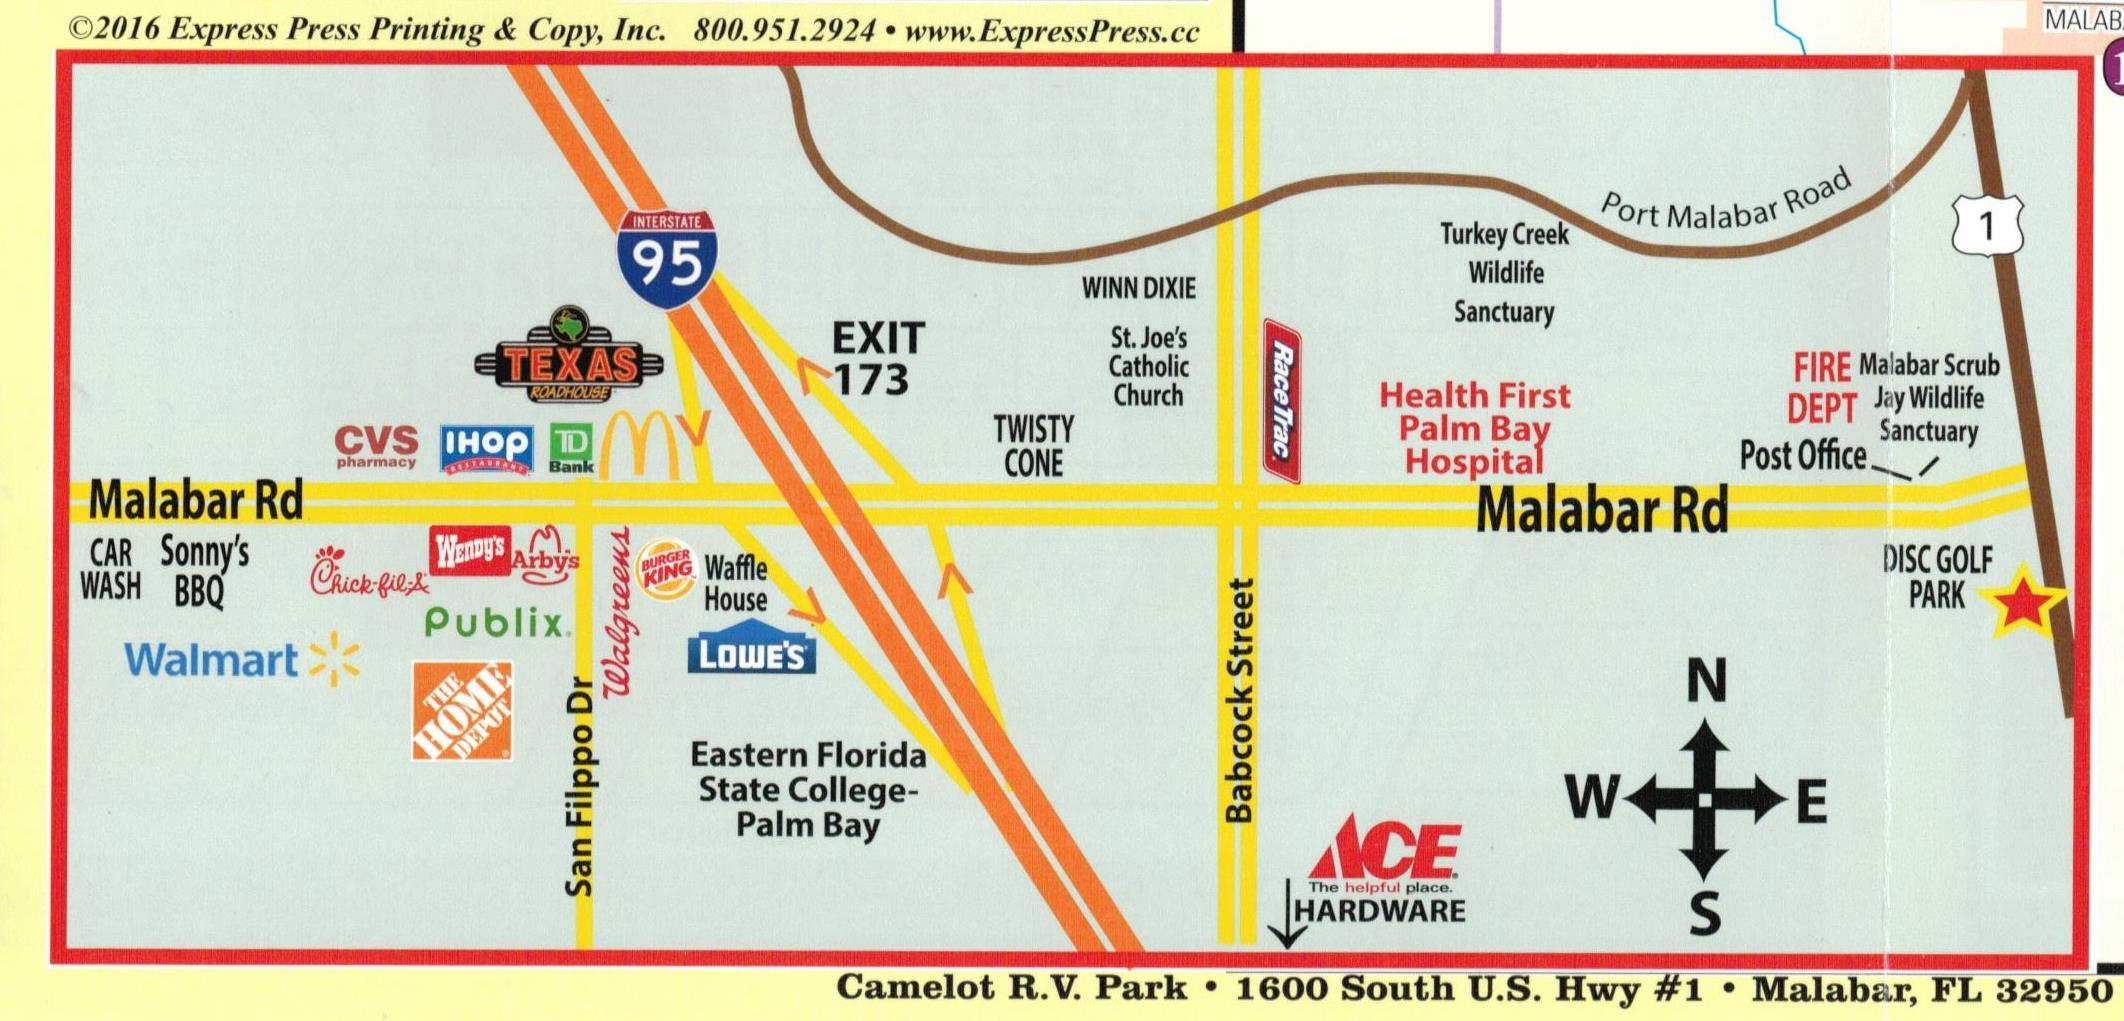 Eastern Florida State College Map.Park Map Camelotrvpark Com